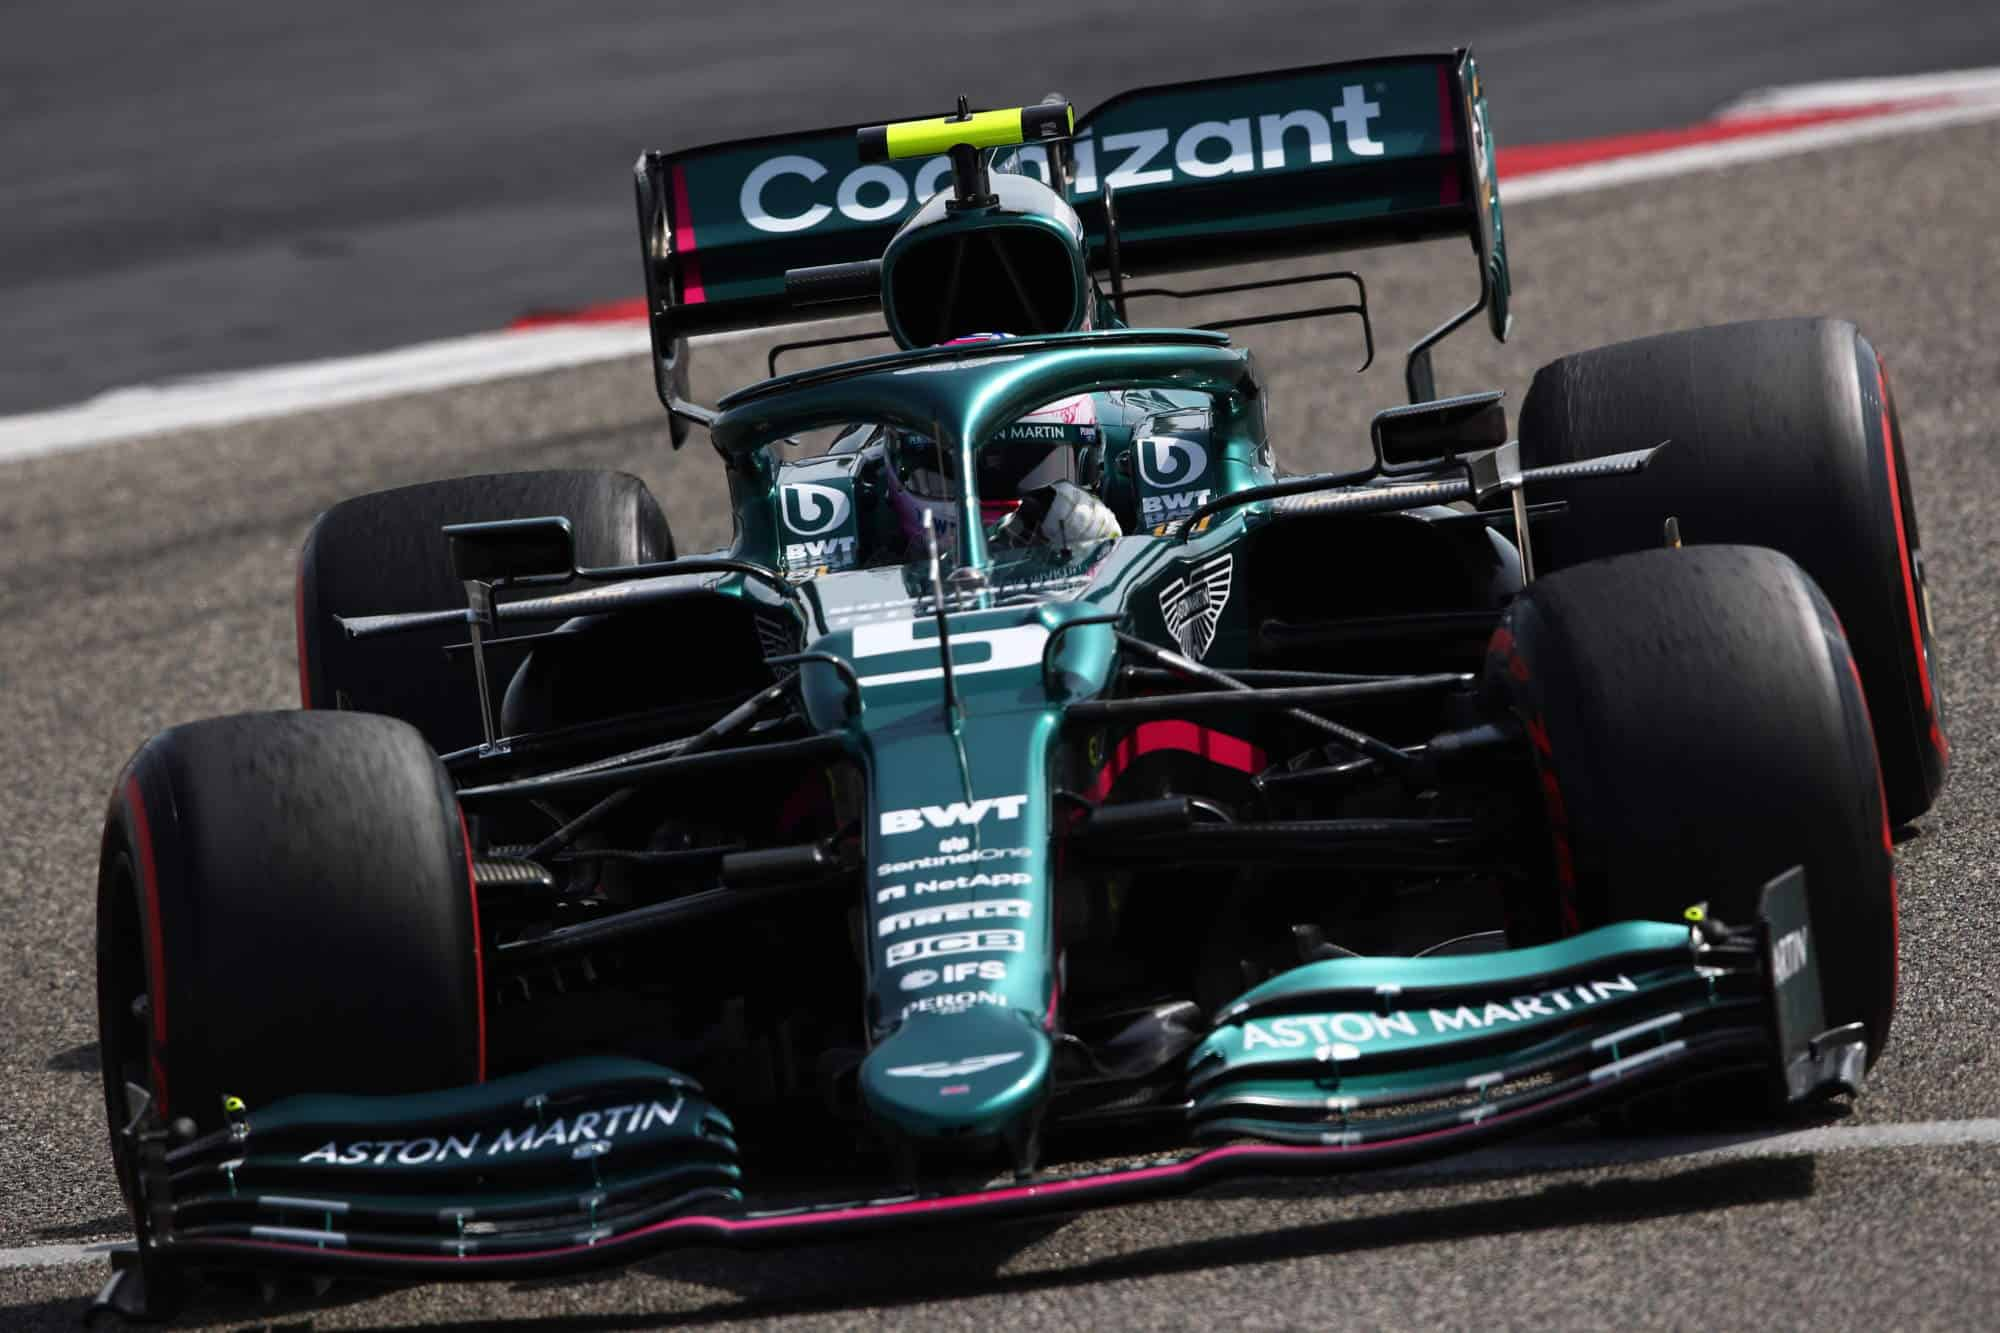 2021 Vettel Aston Martin AMR21 Bahrain testing Day 1 Pirelli C4 Photo Aston Martin